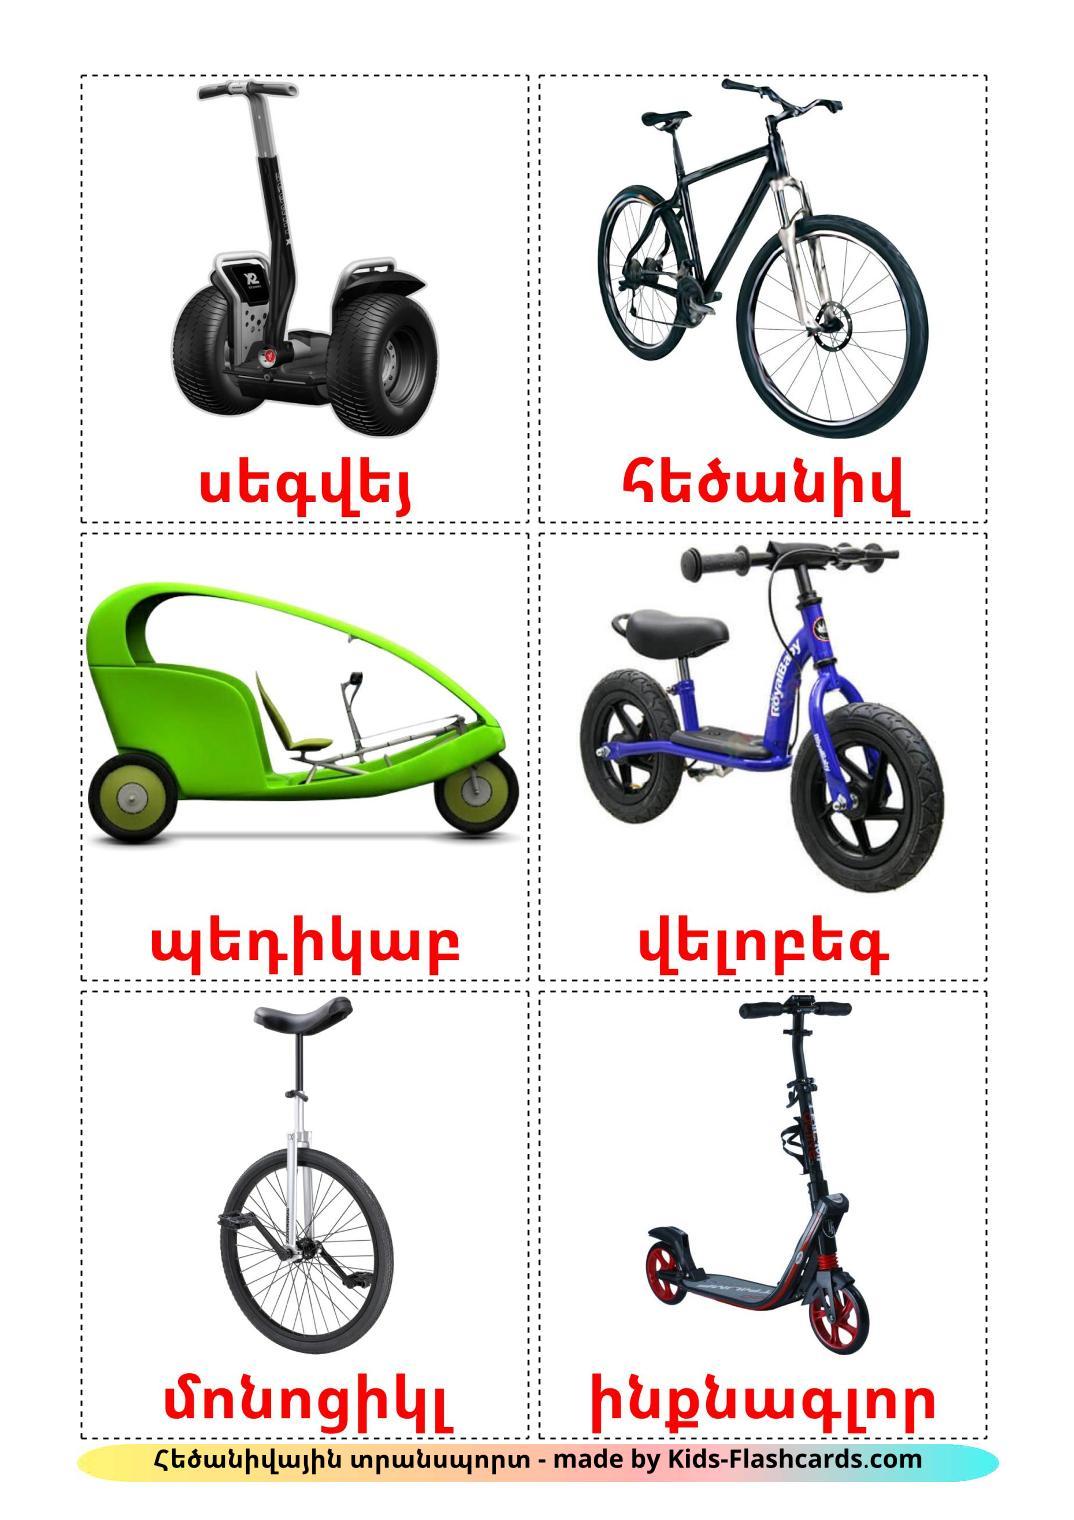 Bicycle transport - 16 Free Printable armenian Flashcards